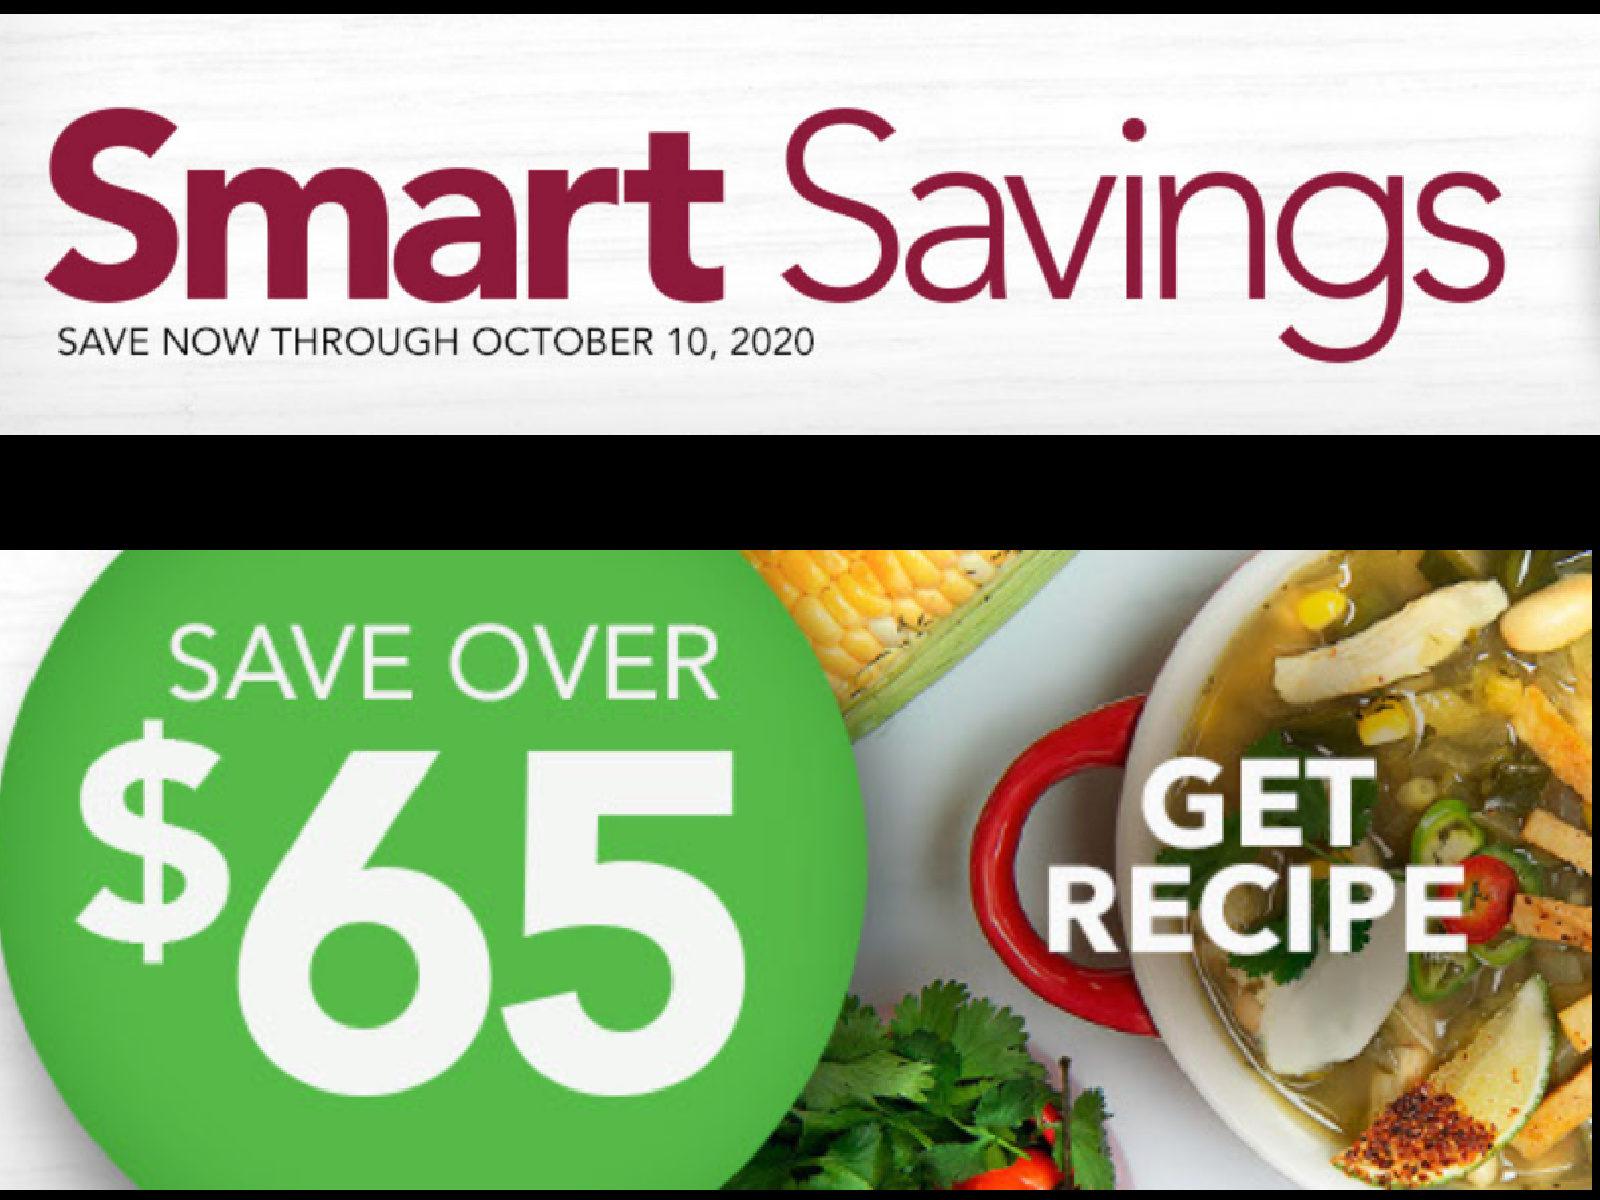 New Publix Booklet - Smart Savings Valid Through 10/10/20 on I Heart Publix